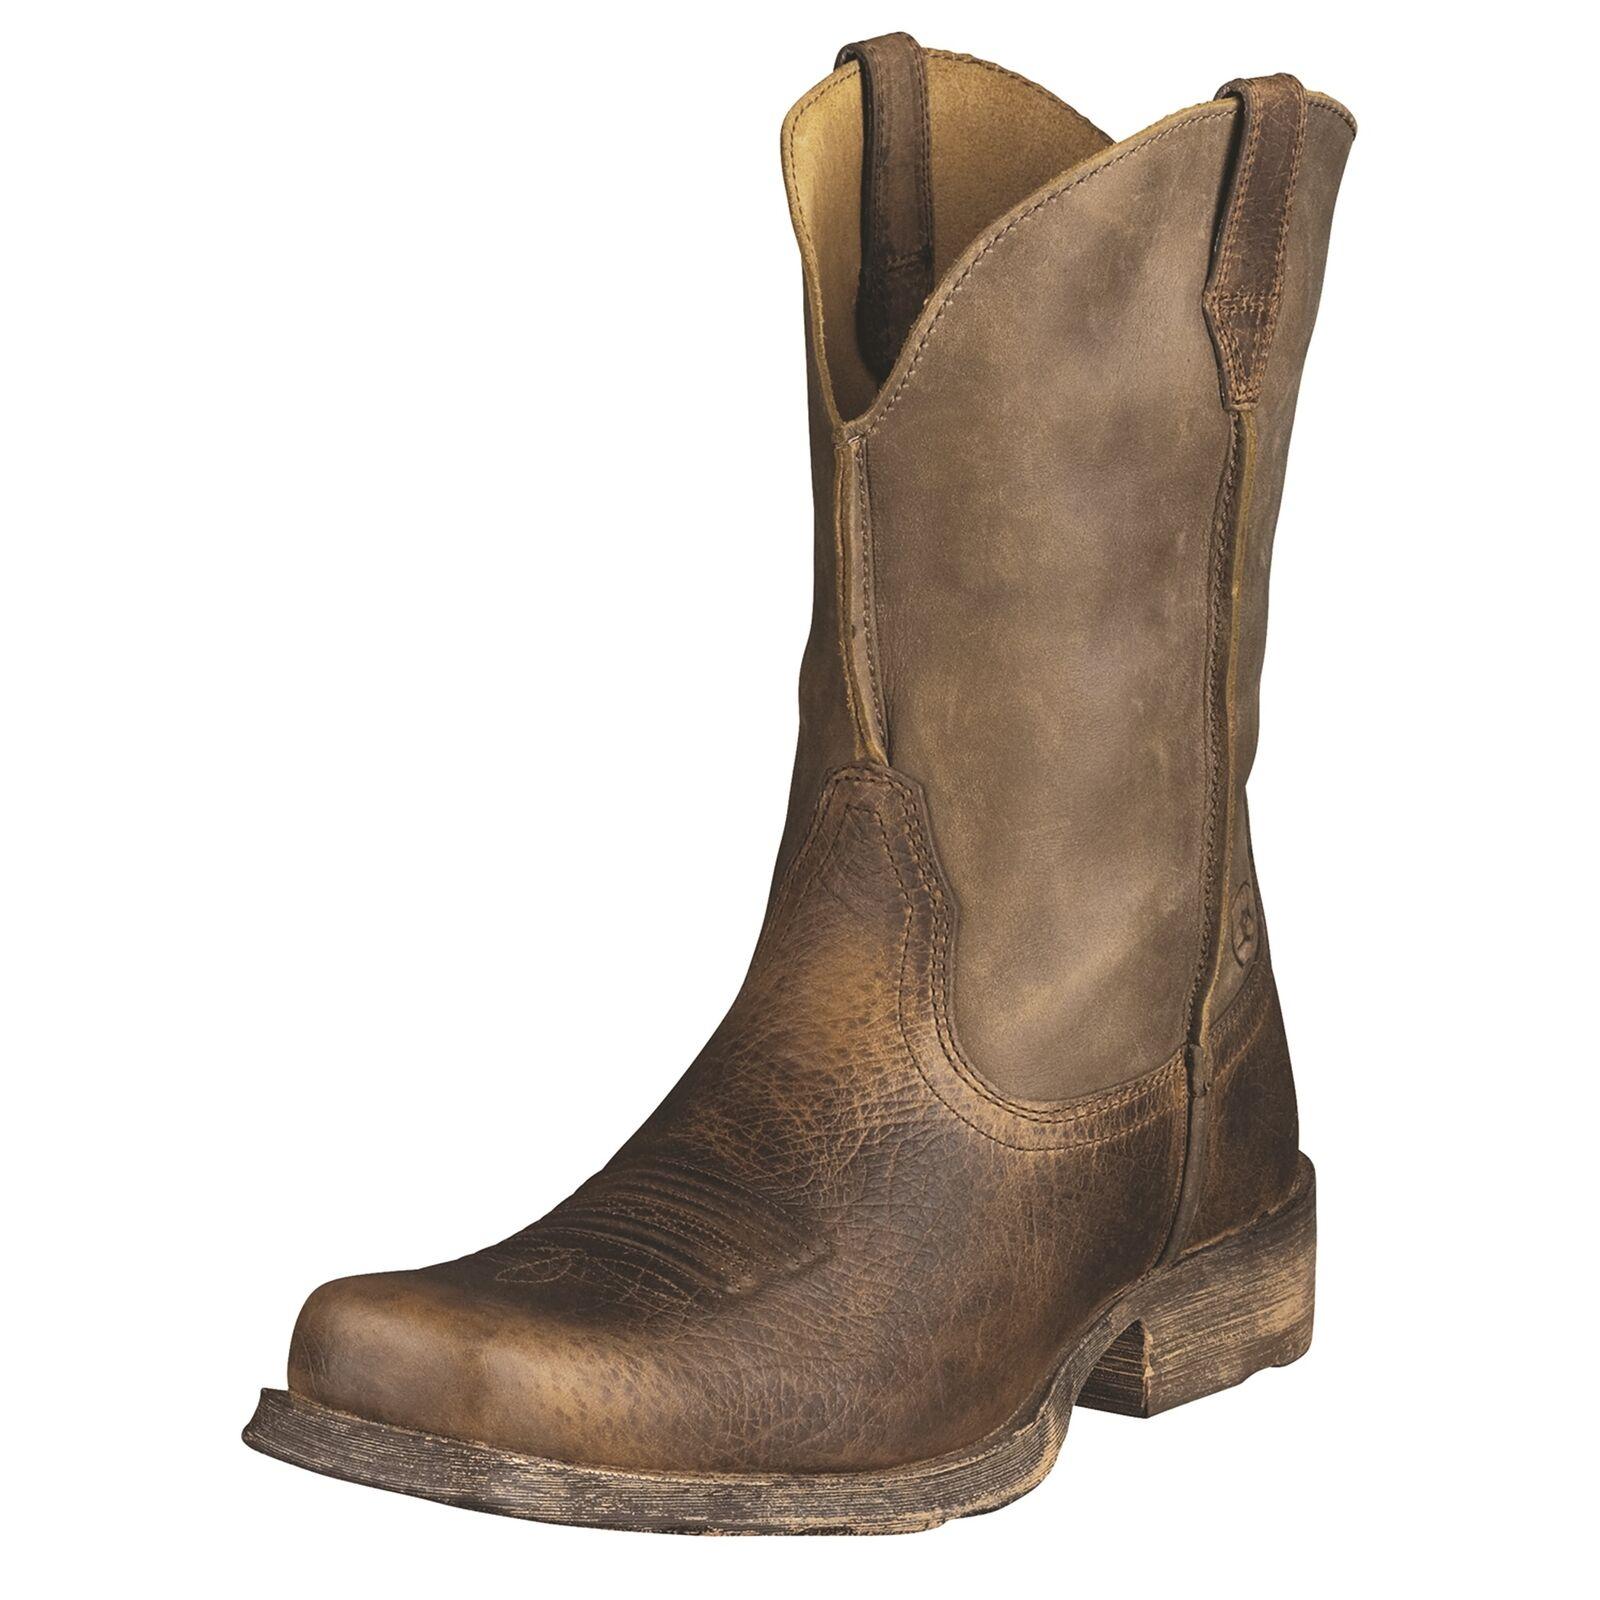 Ariat Rambler angustiado marrón bota para Hombre